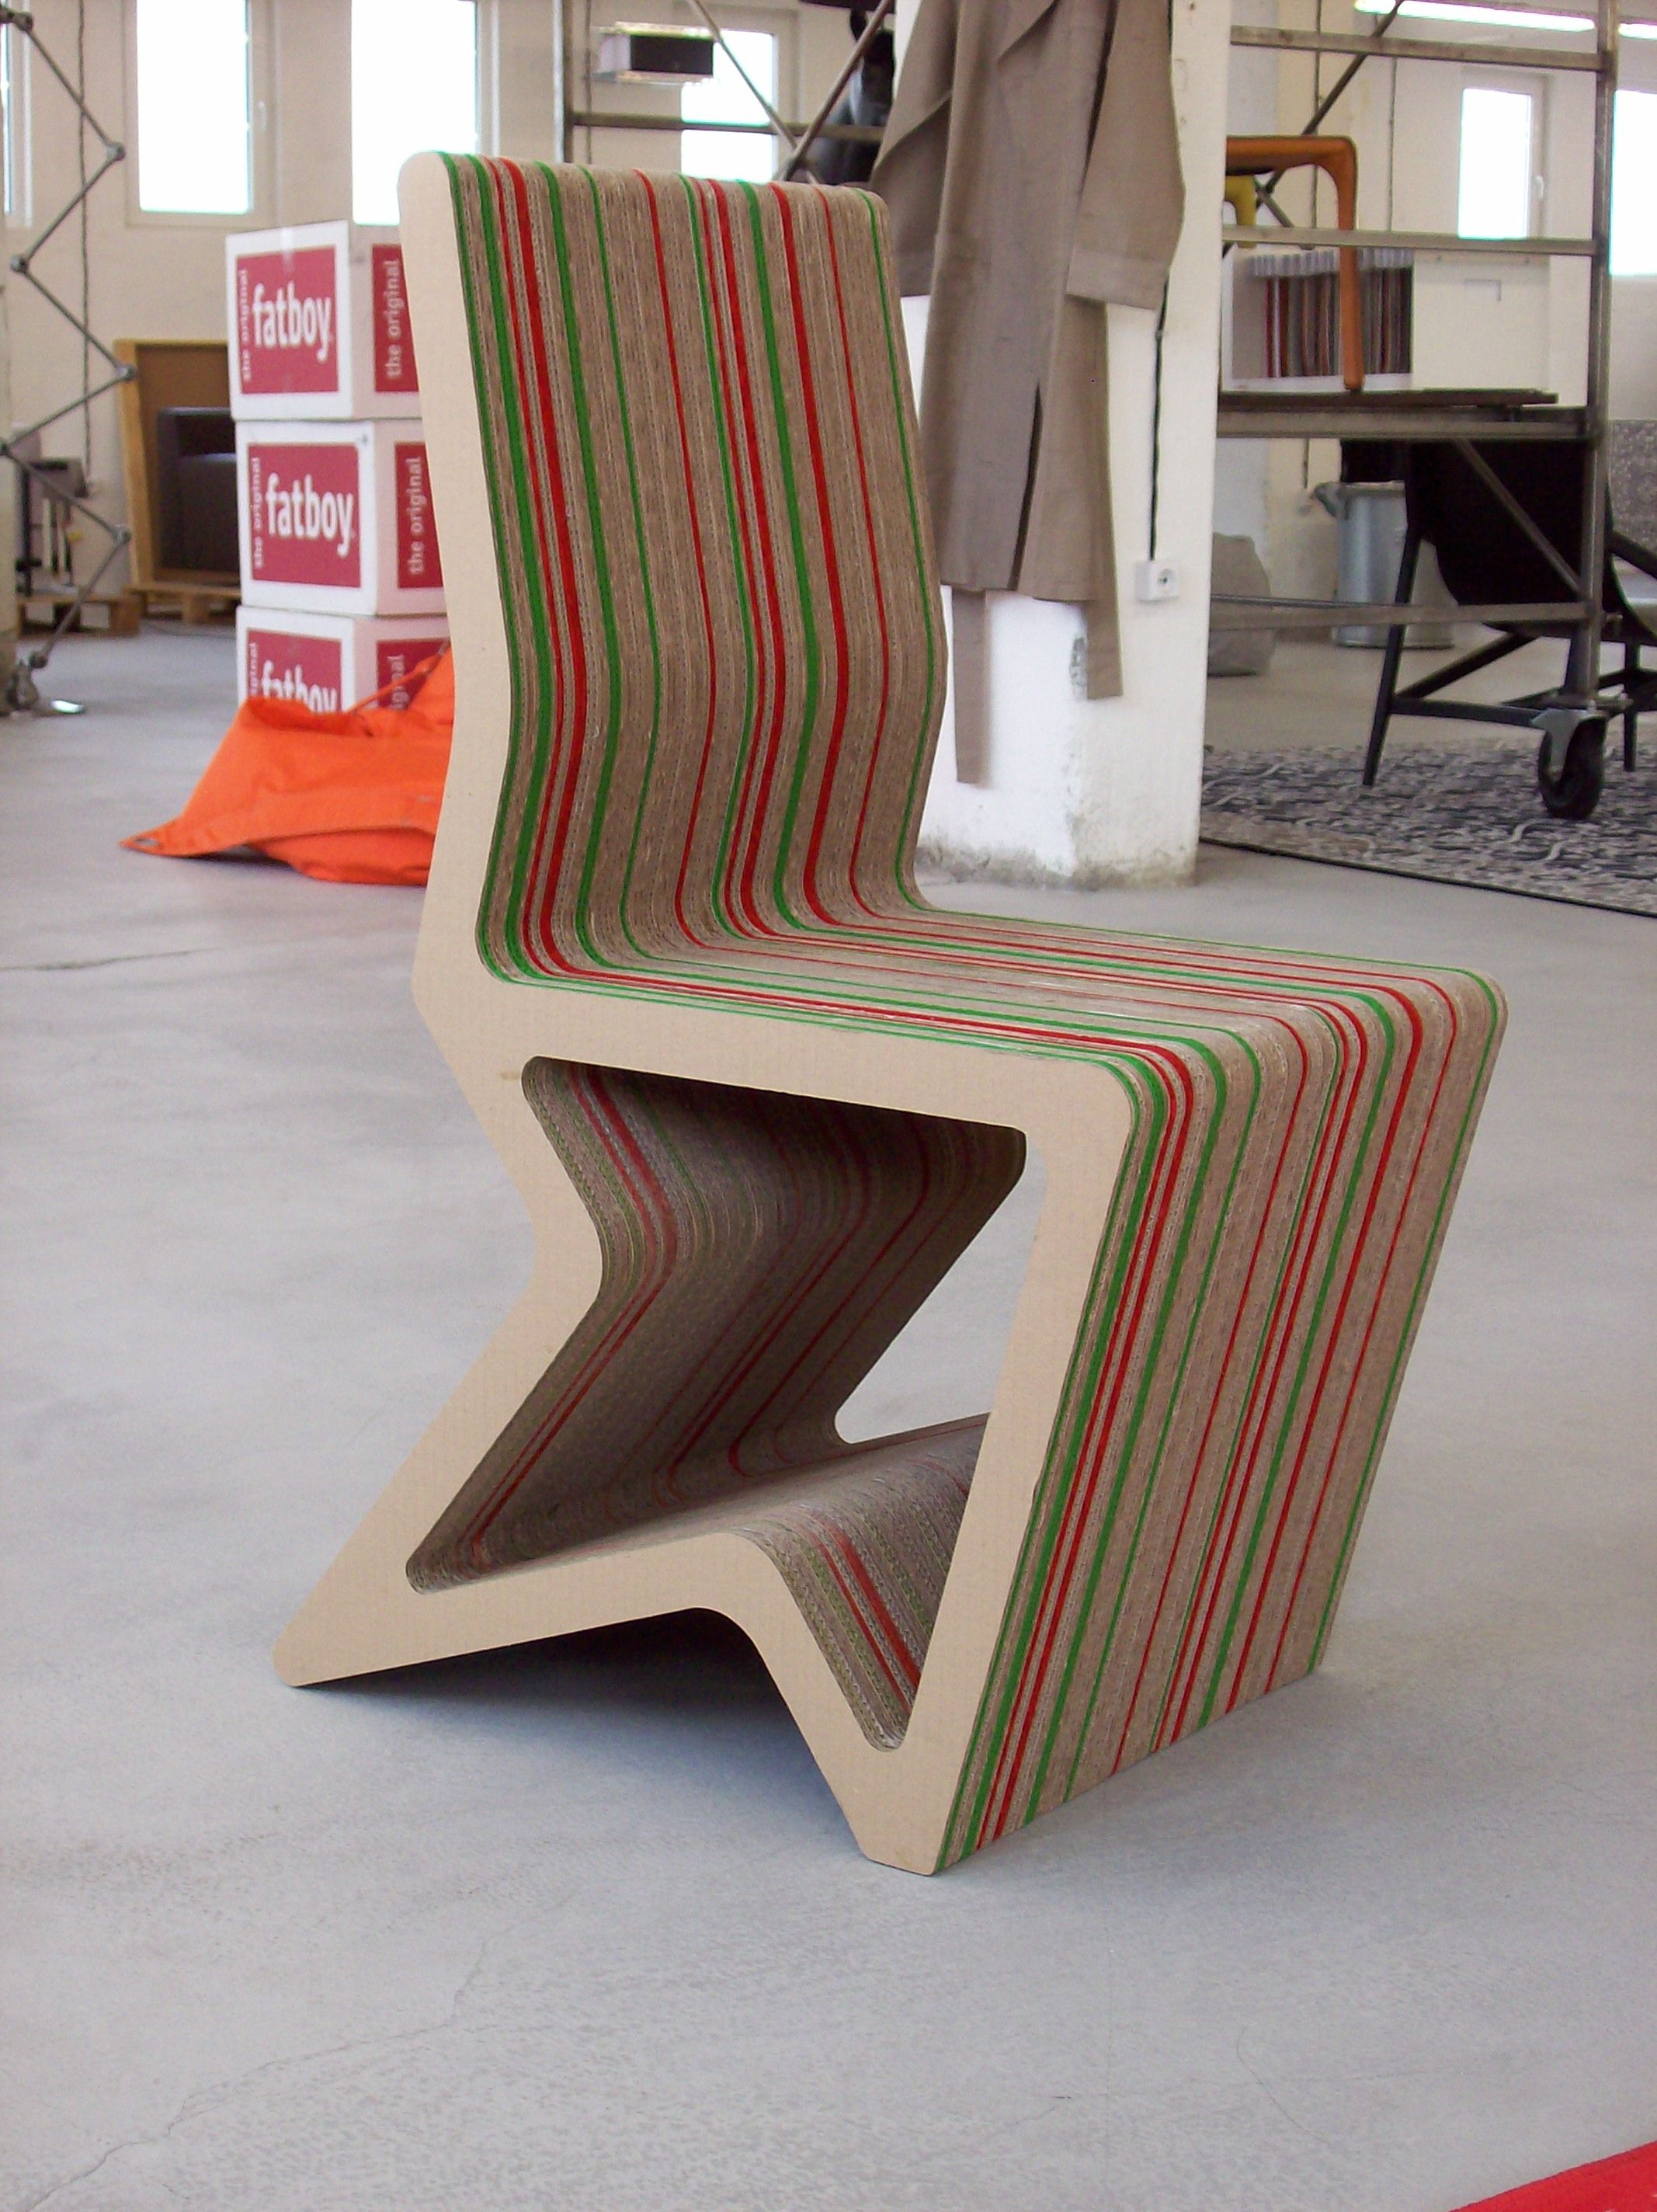 cardboard chair   pallets   möbel, pappe, karton